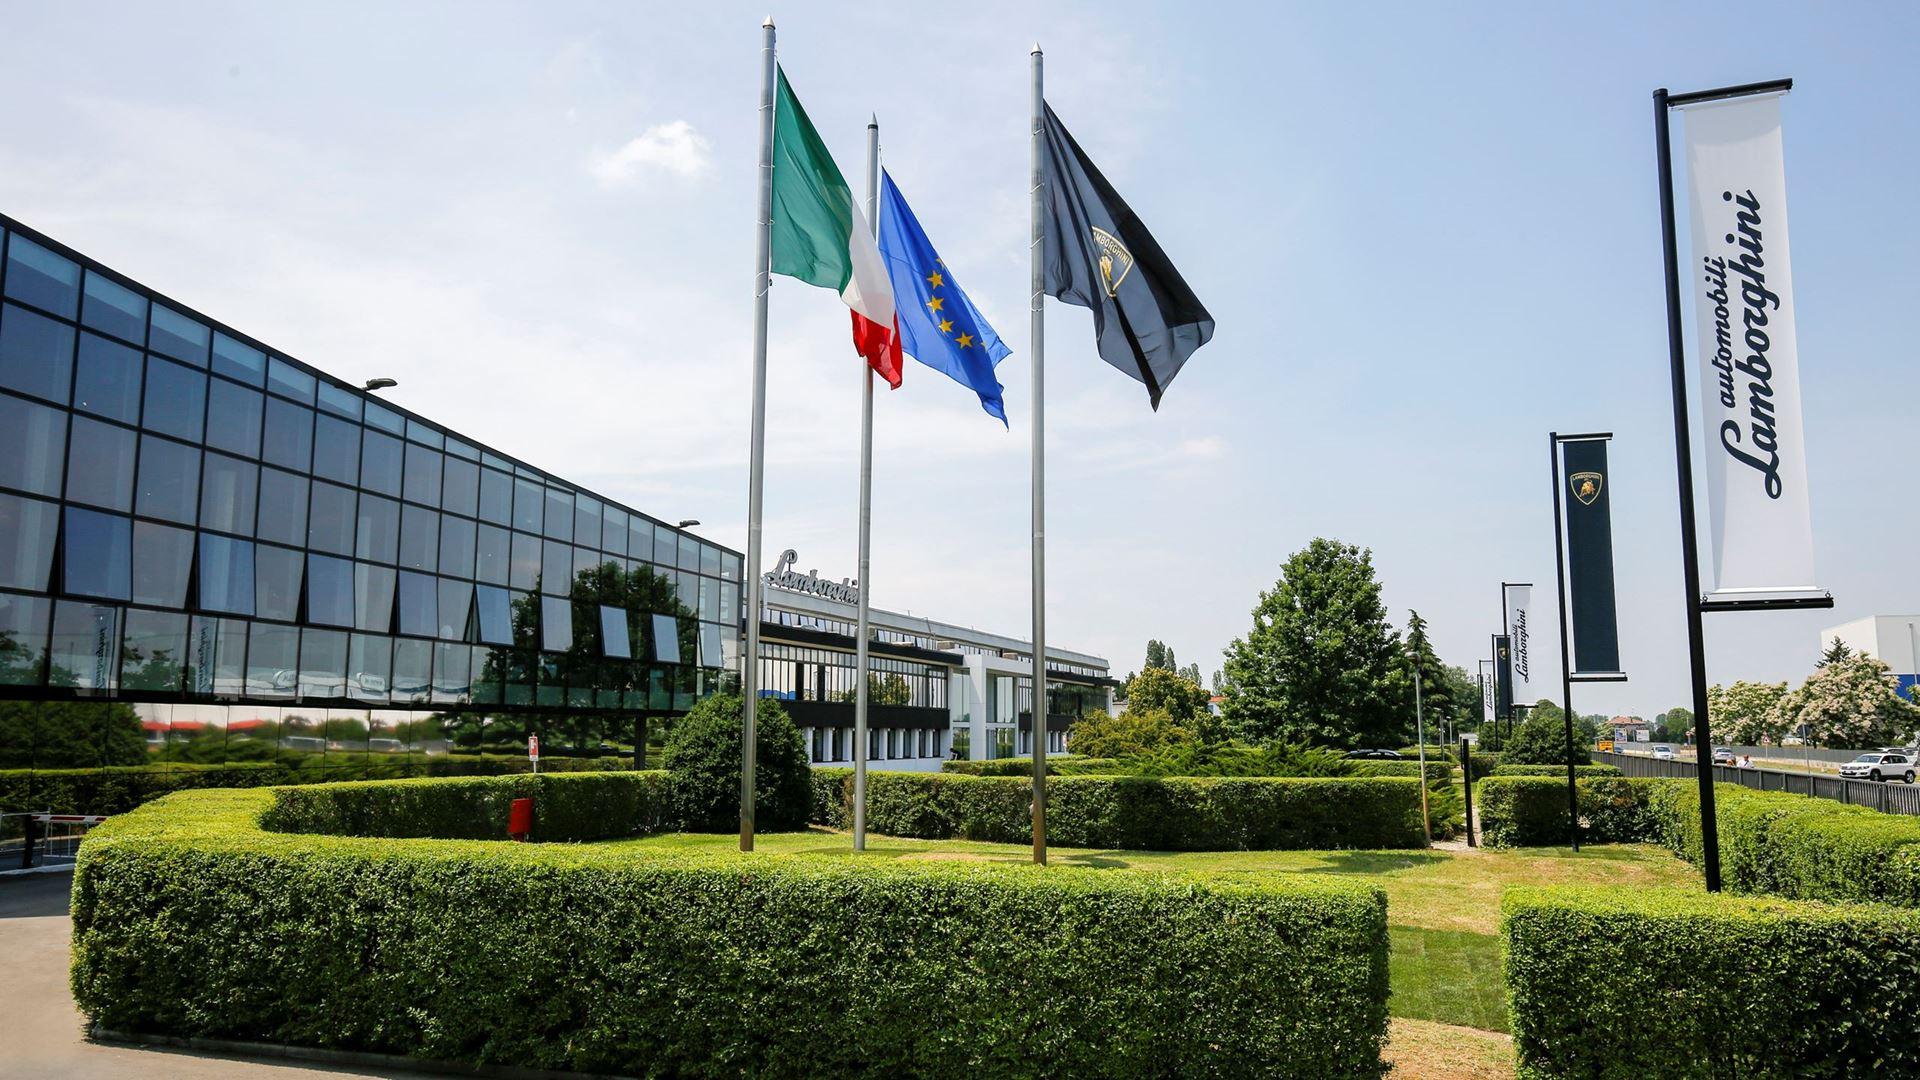 Organizational appointments at Automobili Lamborghini - Image 6